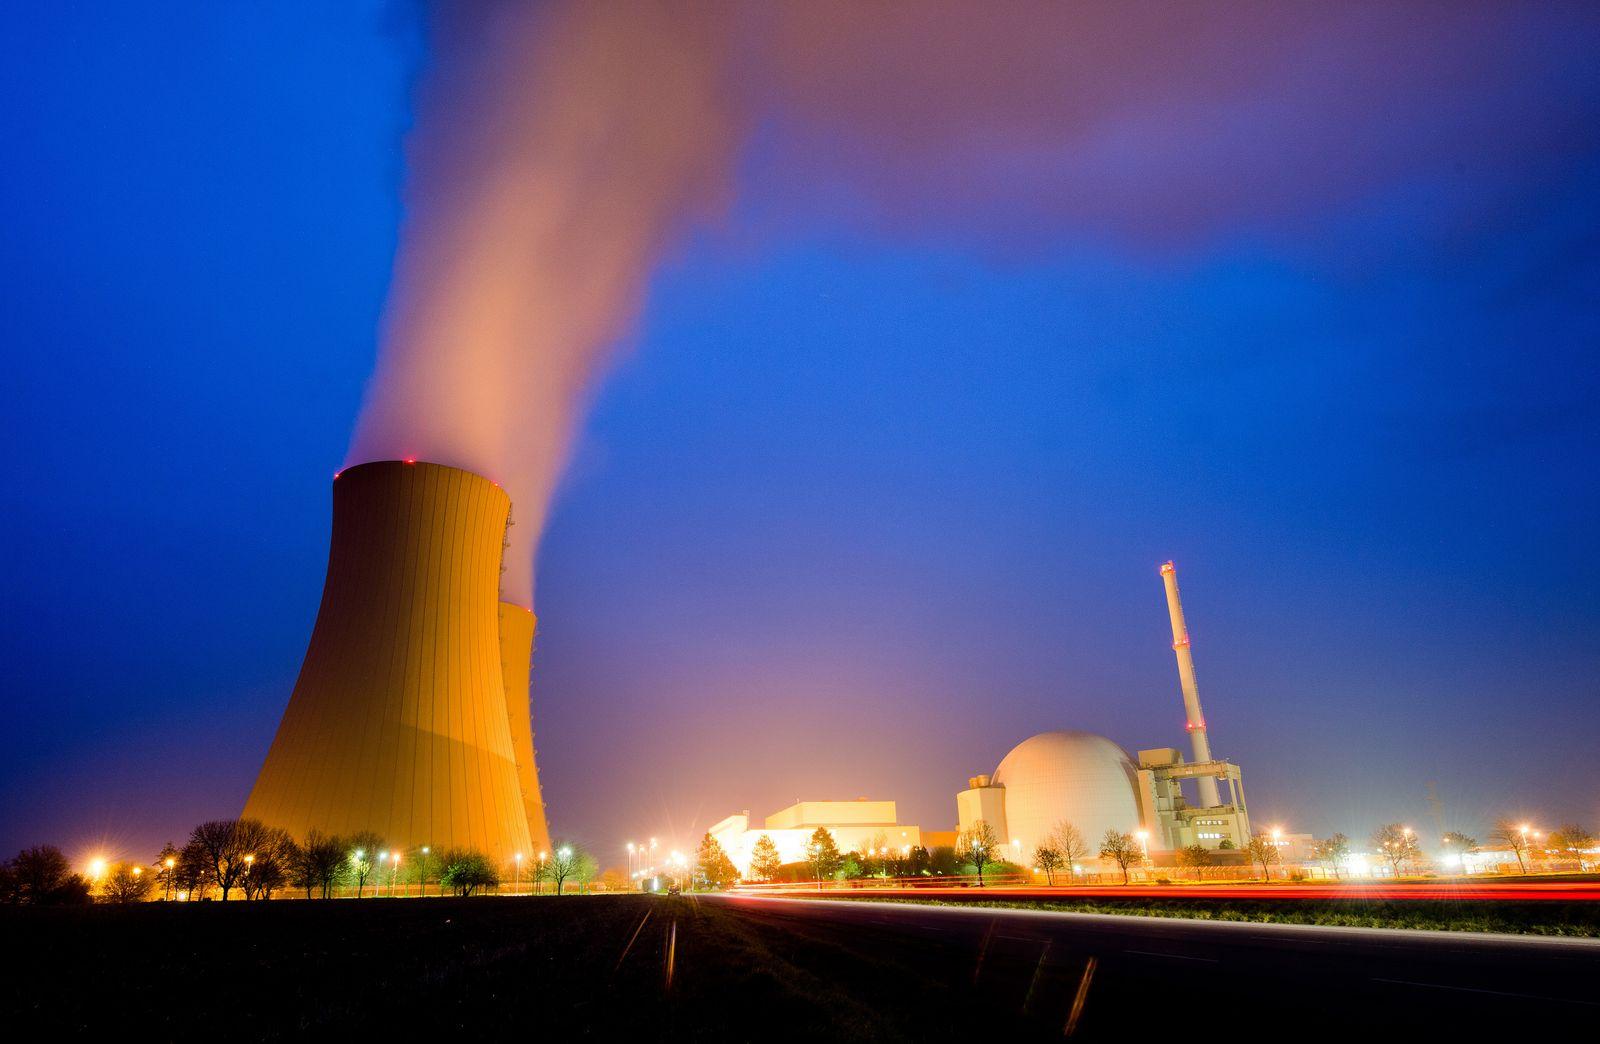 Atomkraftwerk / Atomausstieg / Kernkraftwerk Grohnde